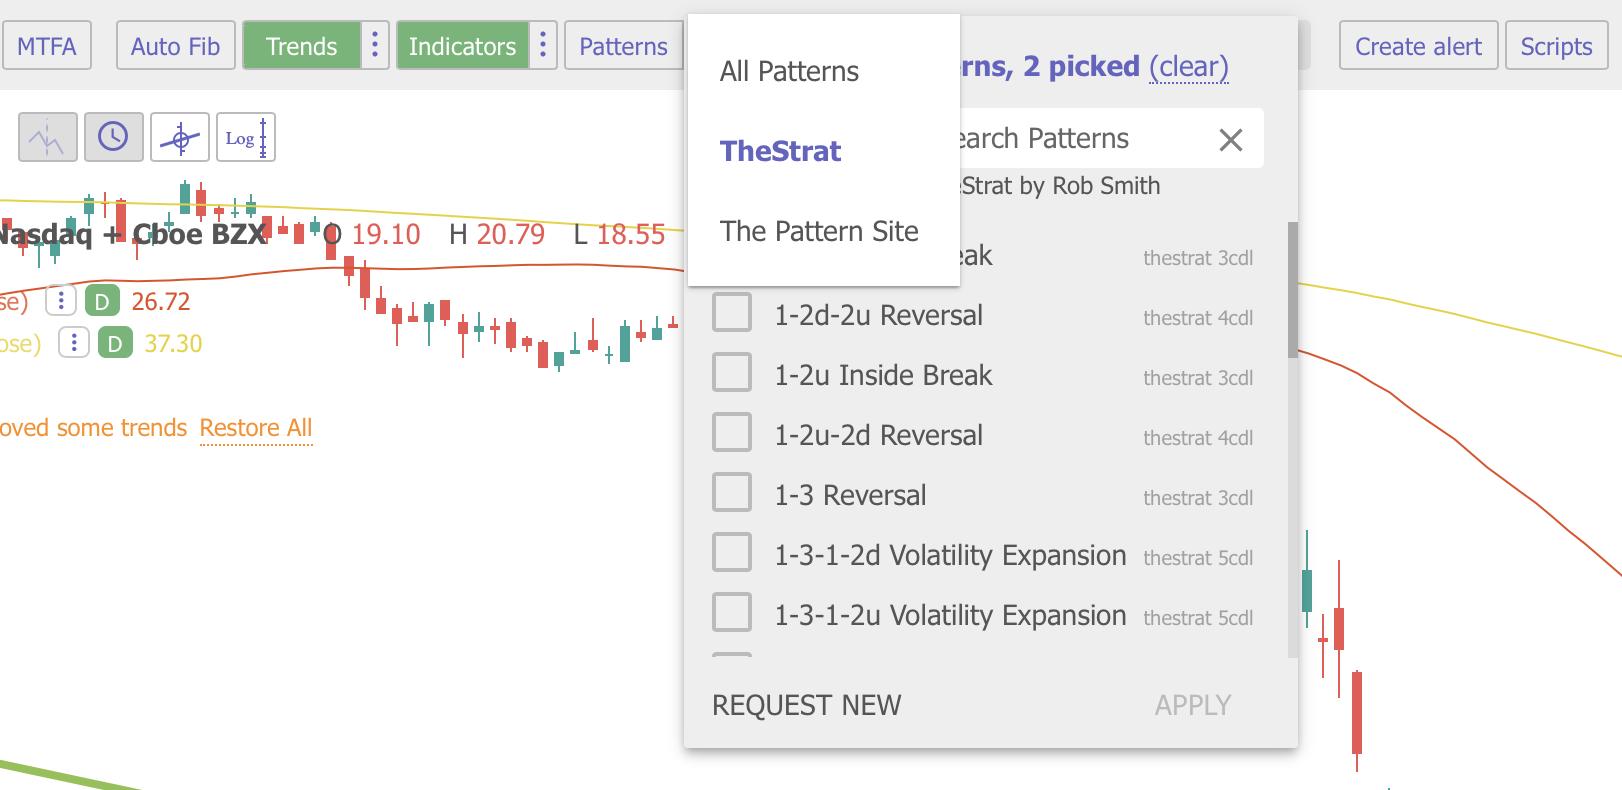 TheSTRAT Patterns